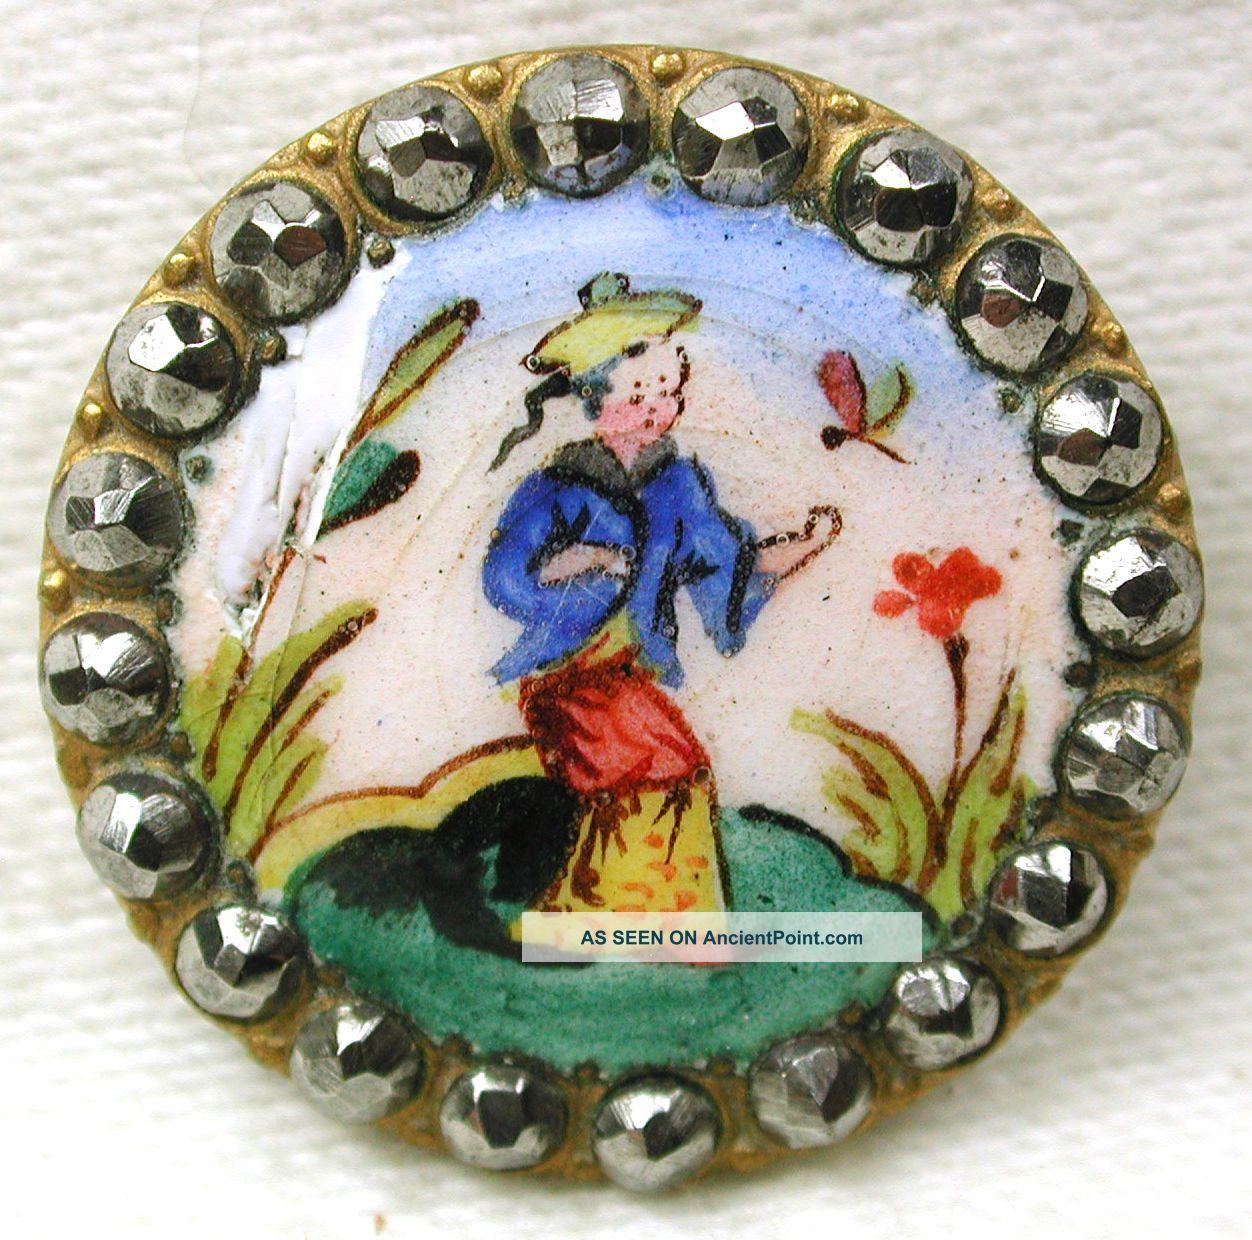 Antique French Enamel Button Woman & Dragonfly W/ Cut Steel Border - 7/8